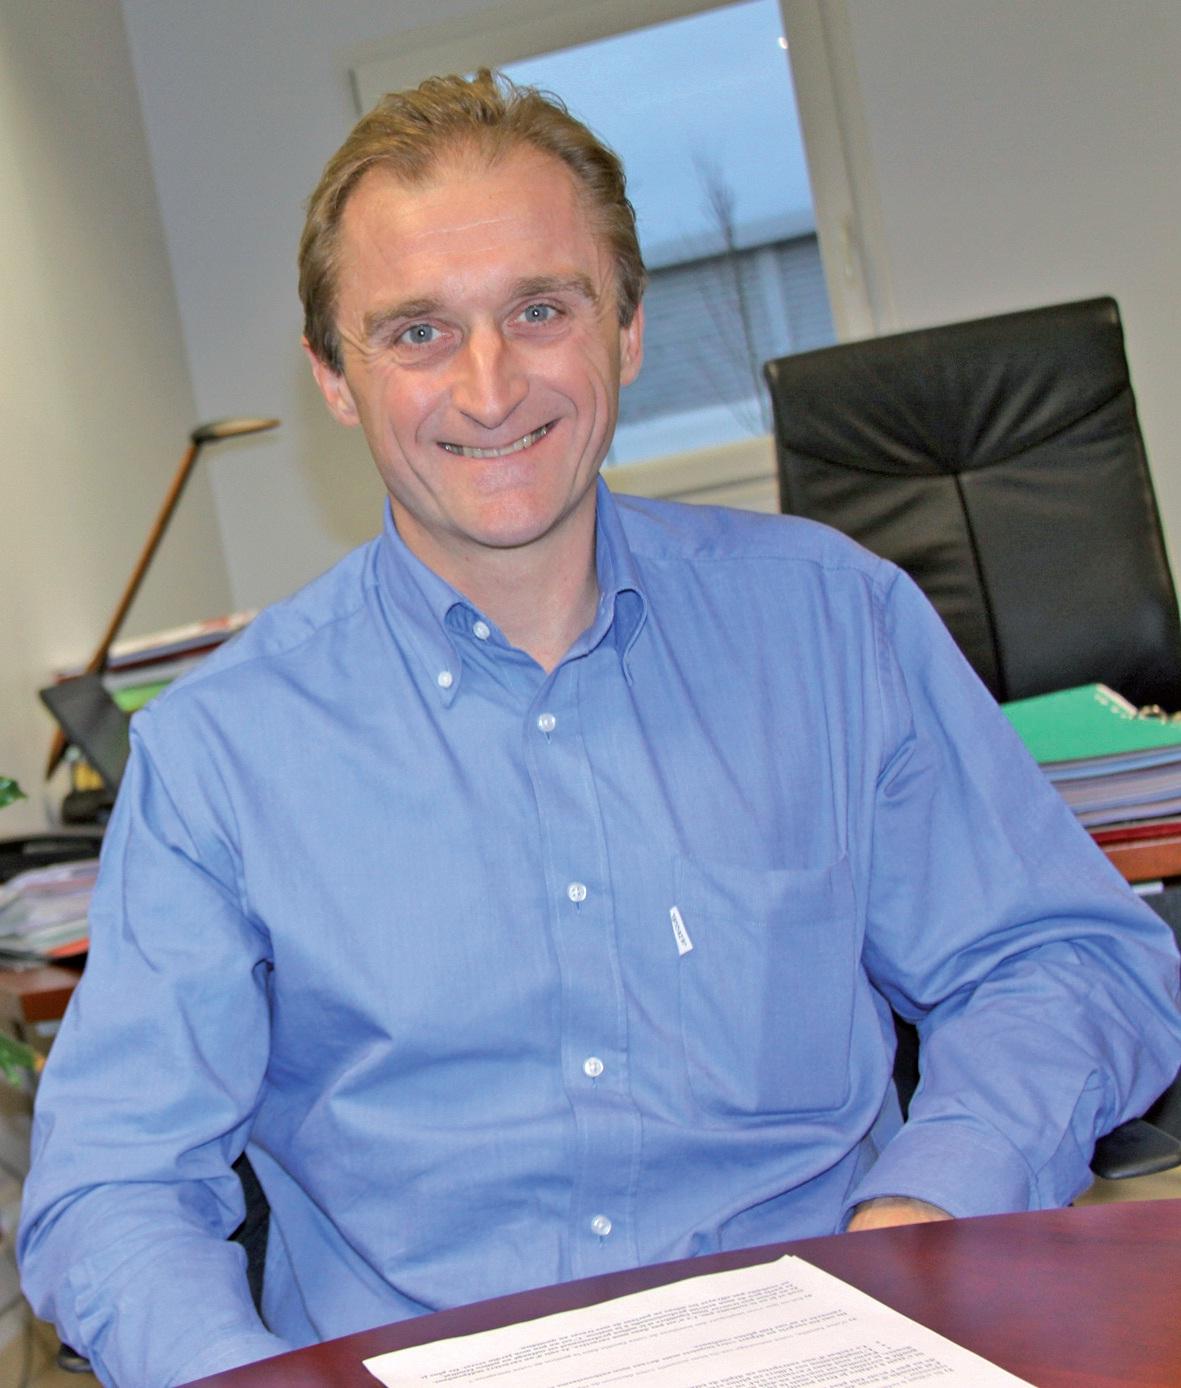 Christophe Waubant est président du groupe club E6 Artois (baptisé Tatoo).